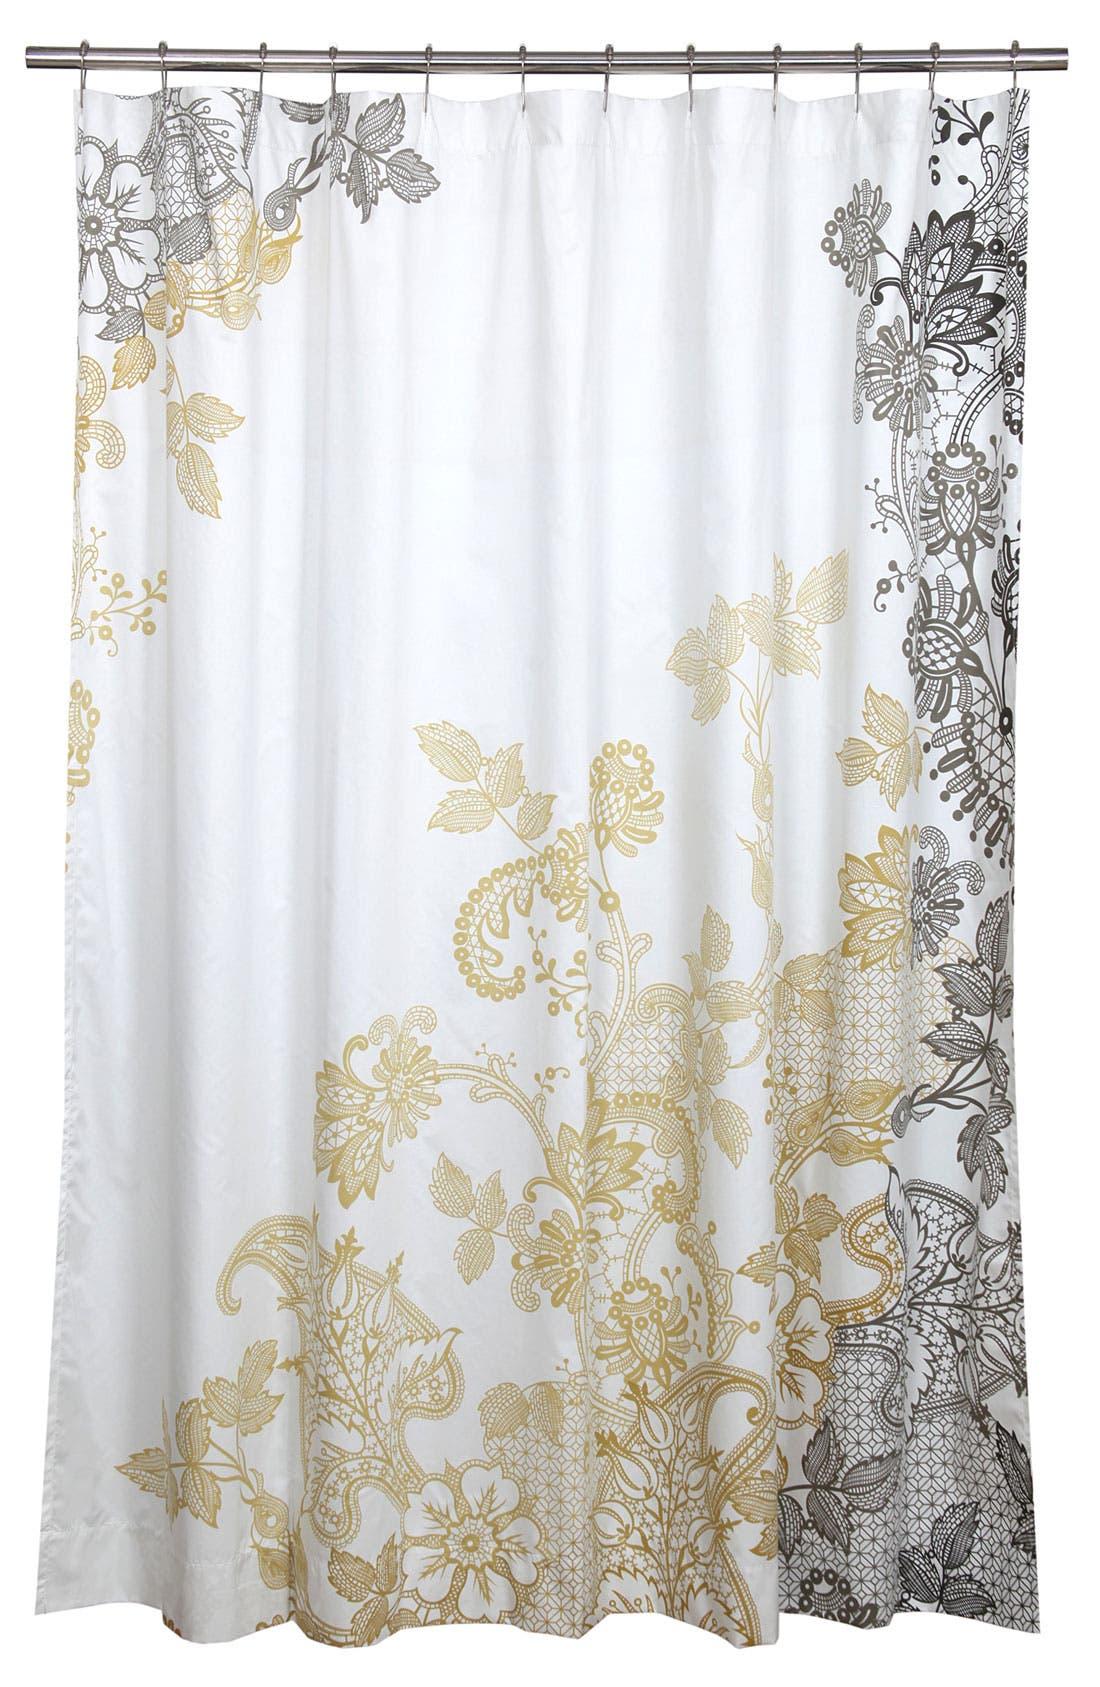 Alternate Image 1 Selected - Blissliving Home 'Evita' Shower Curtain (Online Only)